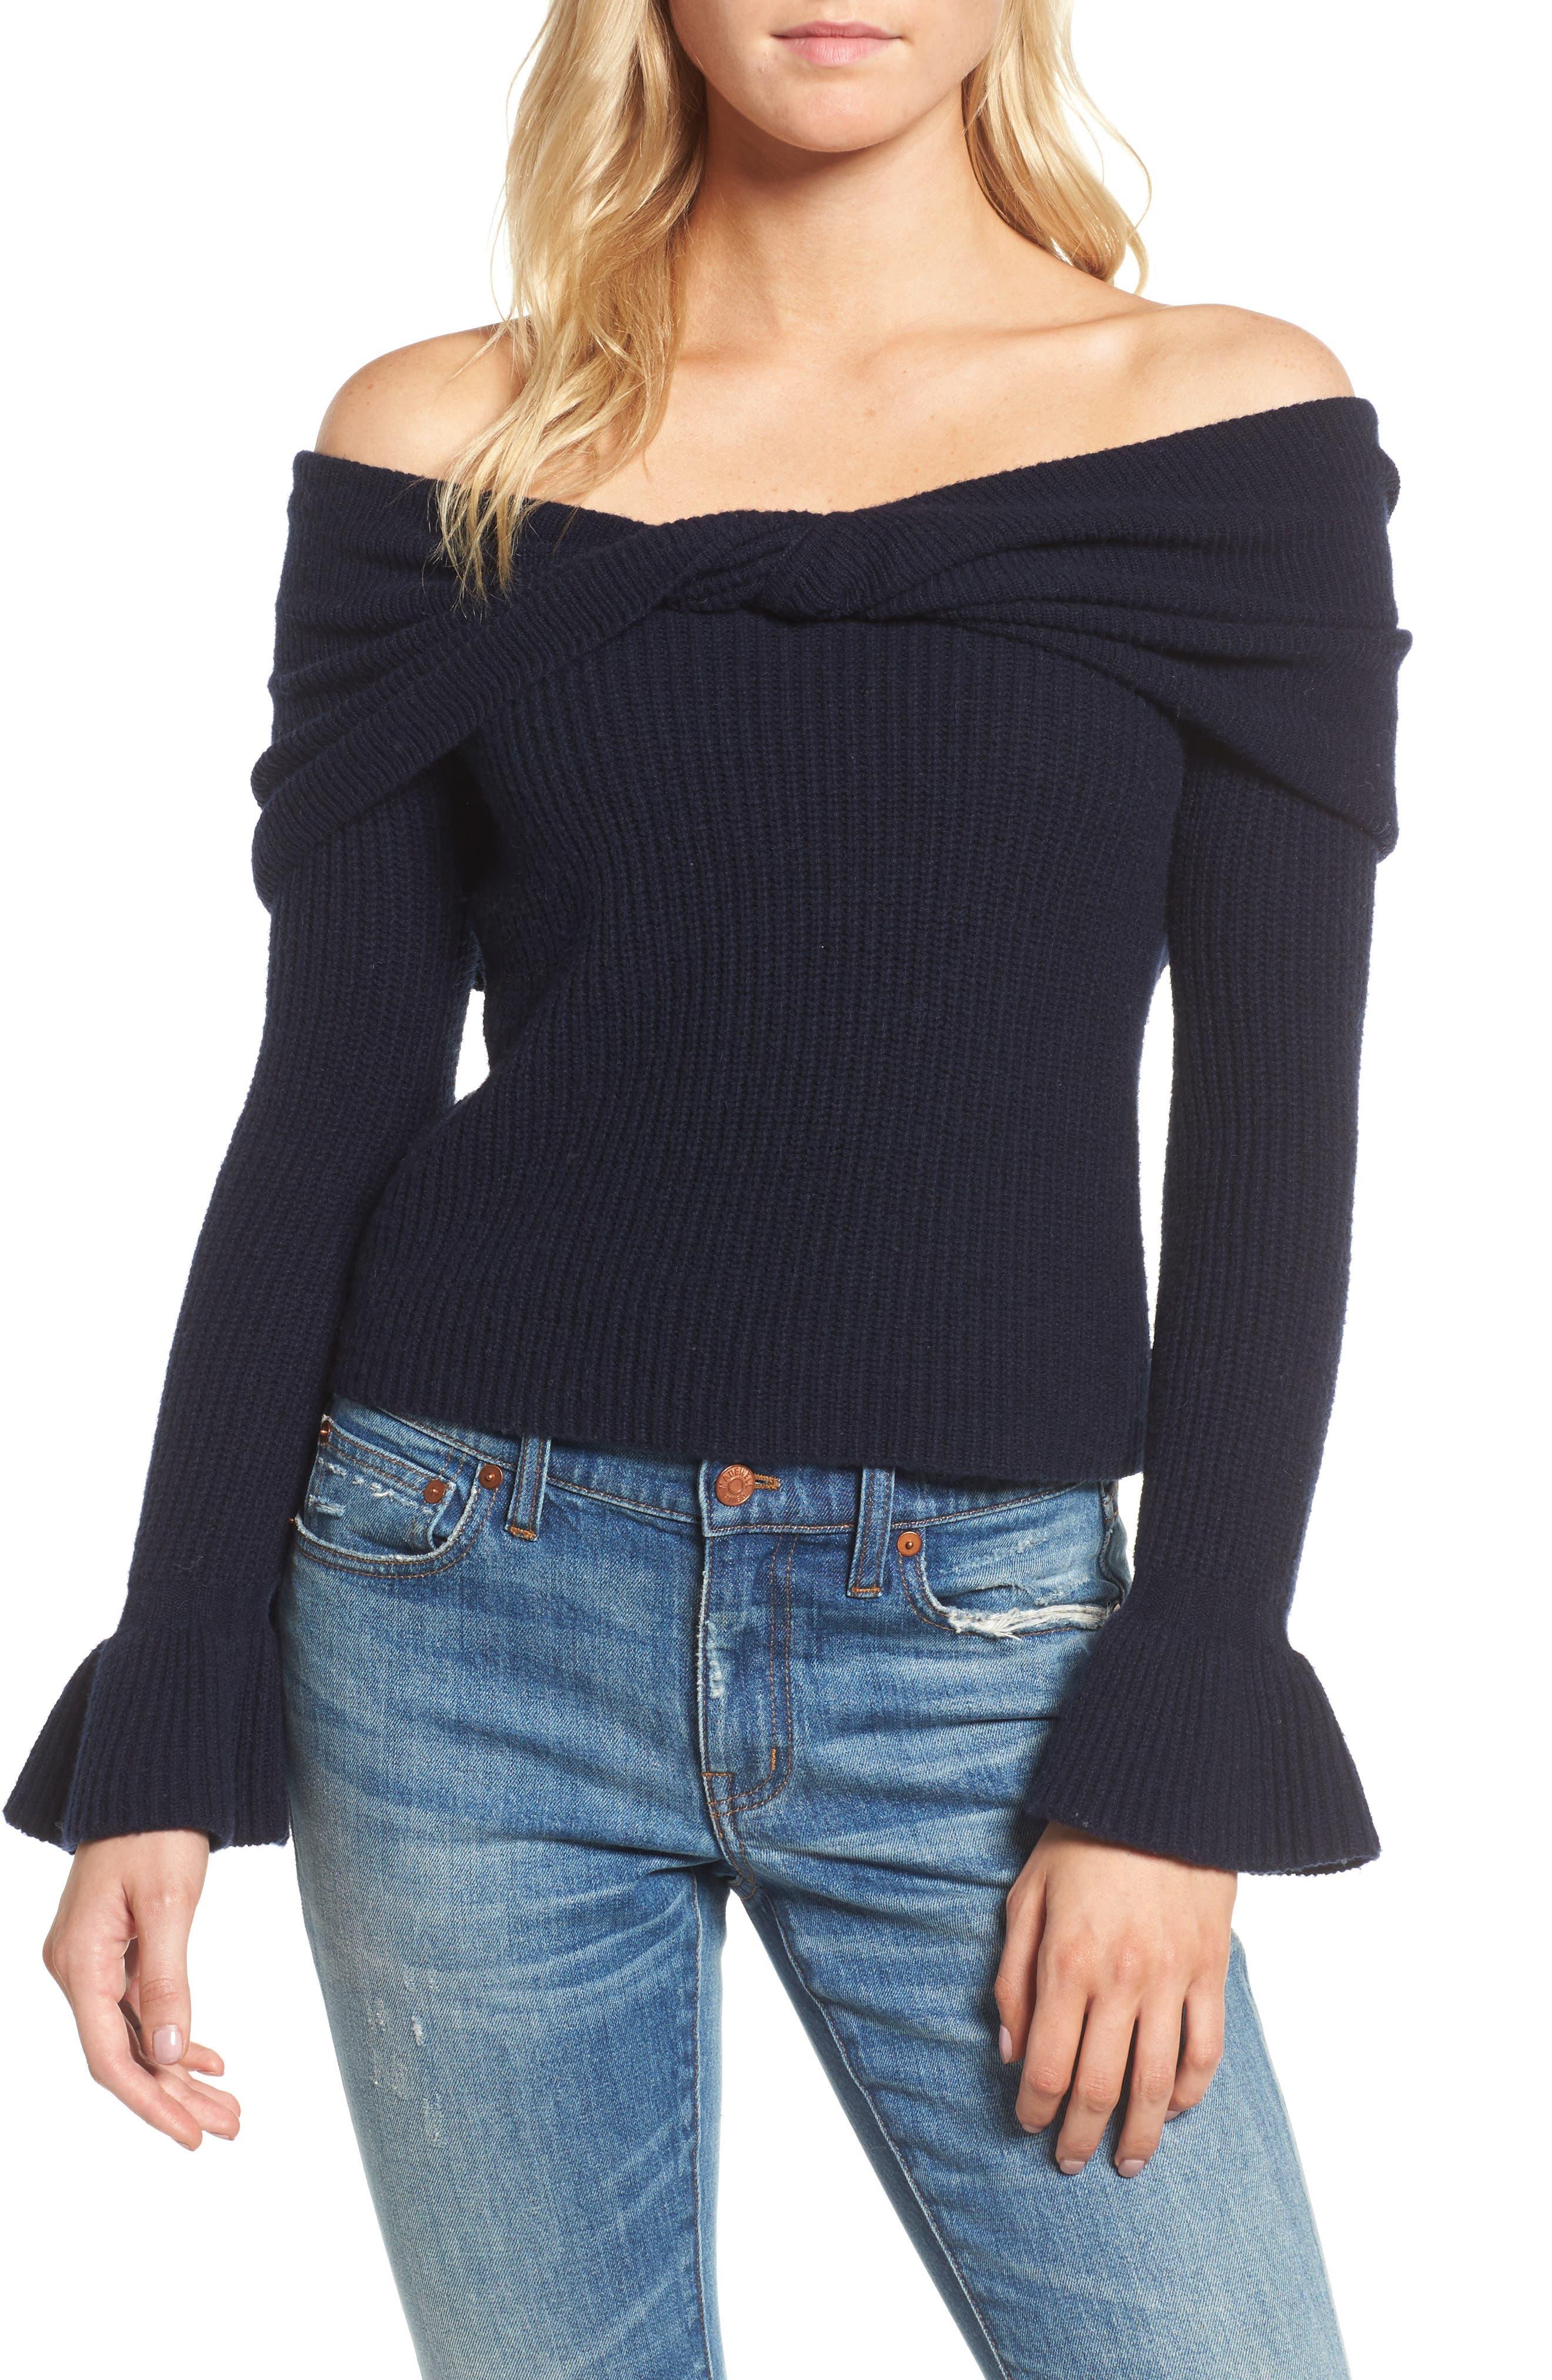 Alternate Image 1 Selected - Ella Moss Off the Shoulder Sweater